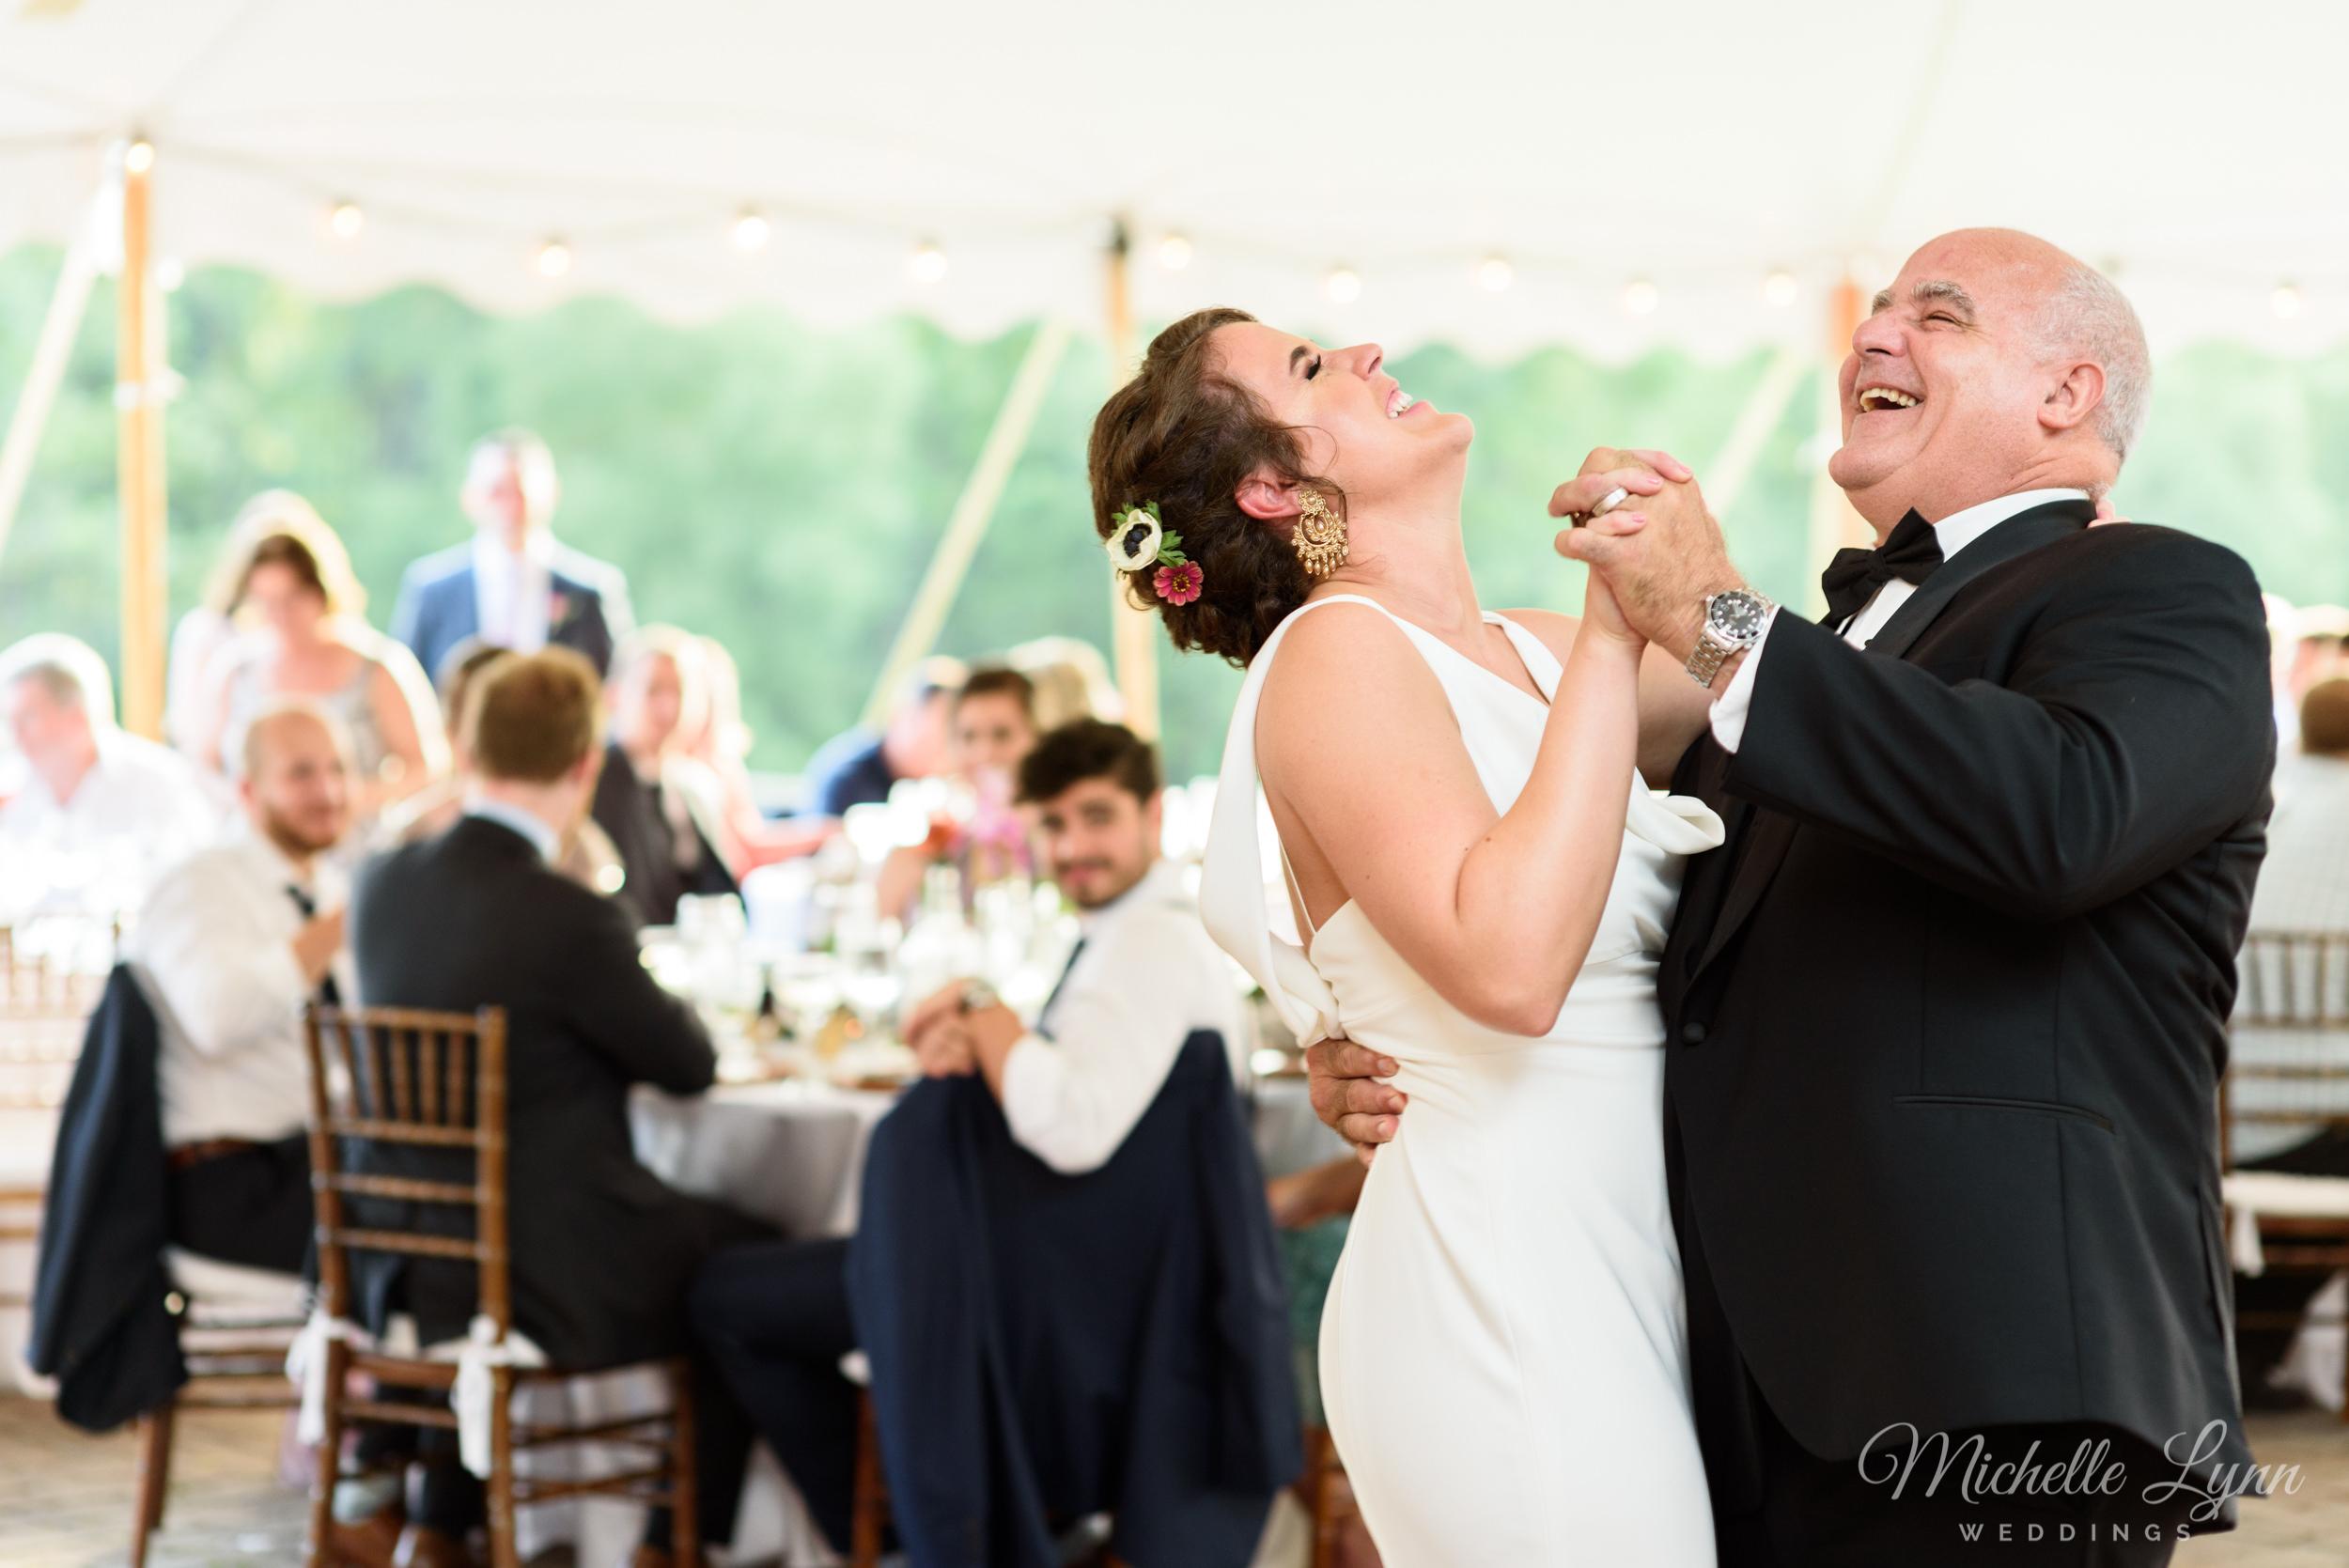 mlw-unionville-vineyards-nj-wedding-photography-84.jpg